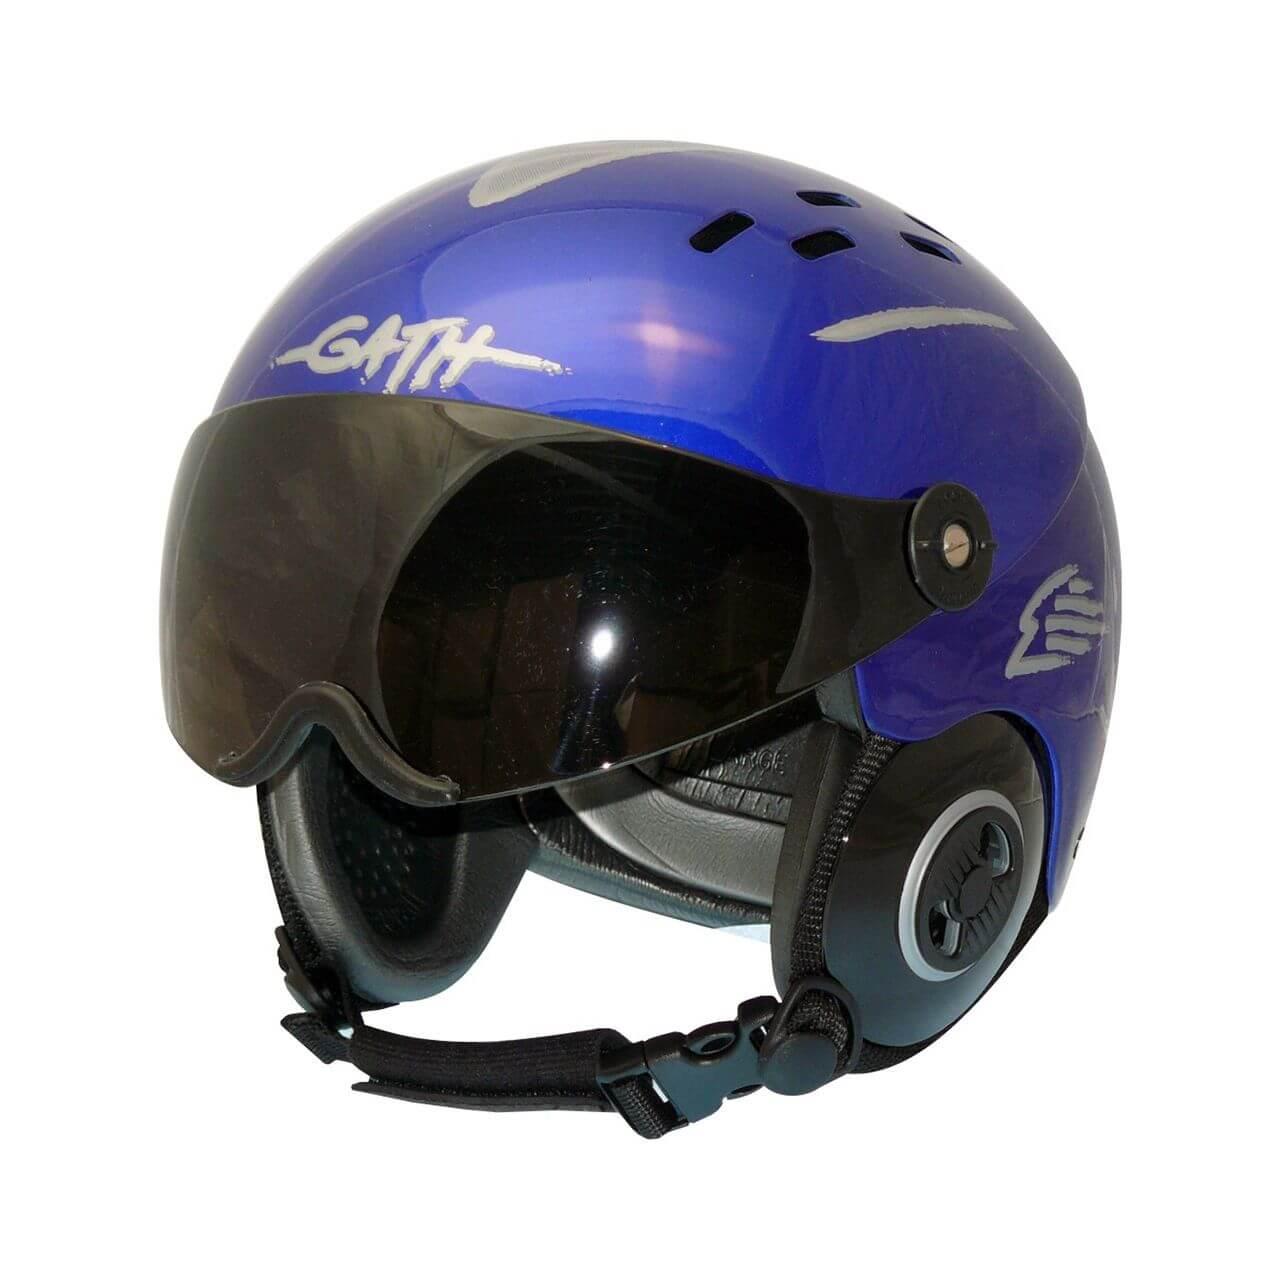 51fe9a57c9cd0 Gath Half Face Visor (Gedi SFC) - Extreme Sports